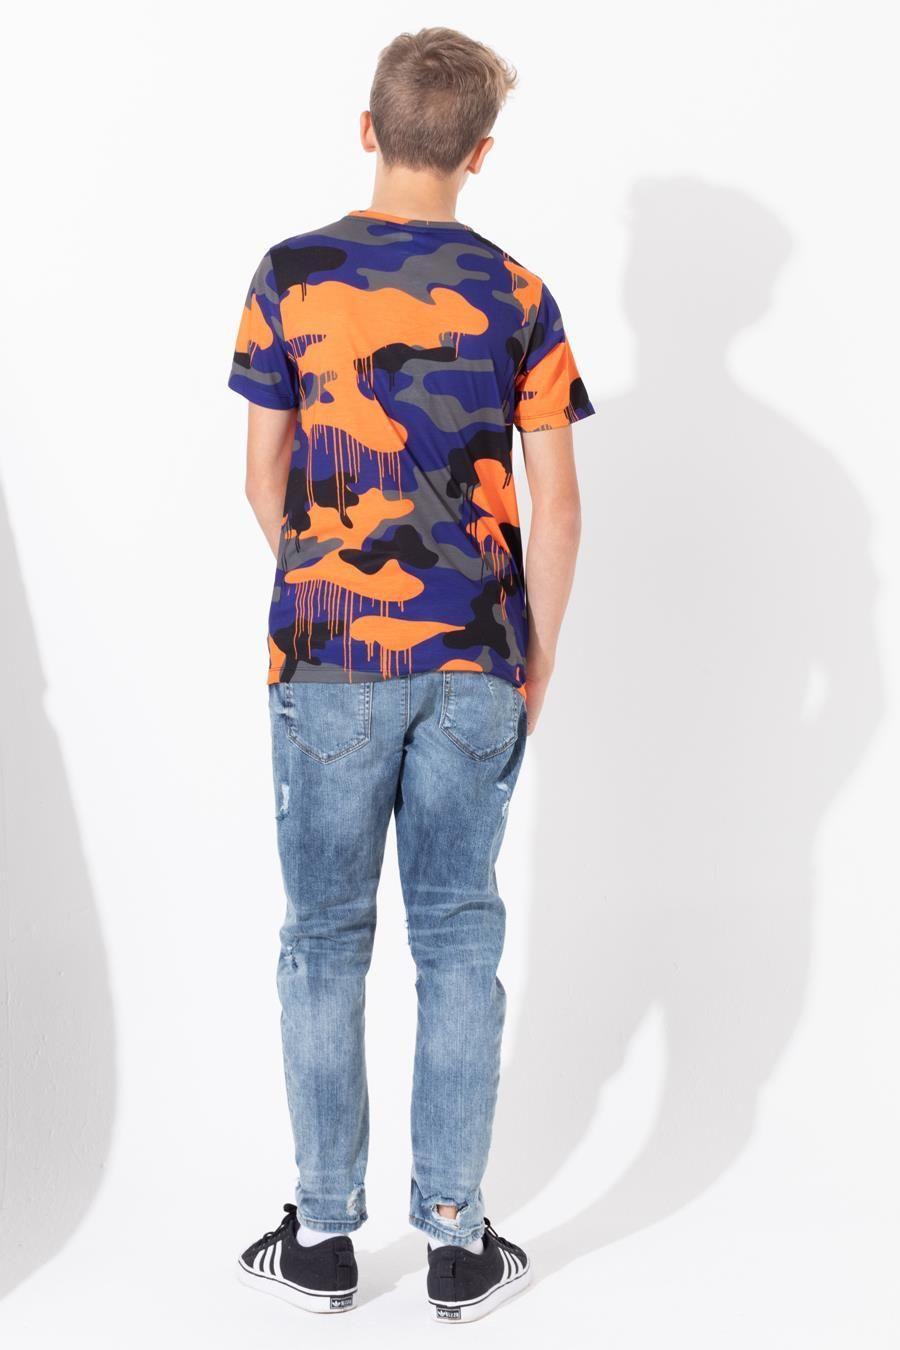 Hype Camo Drips Script Kids T-Shirt